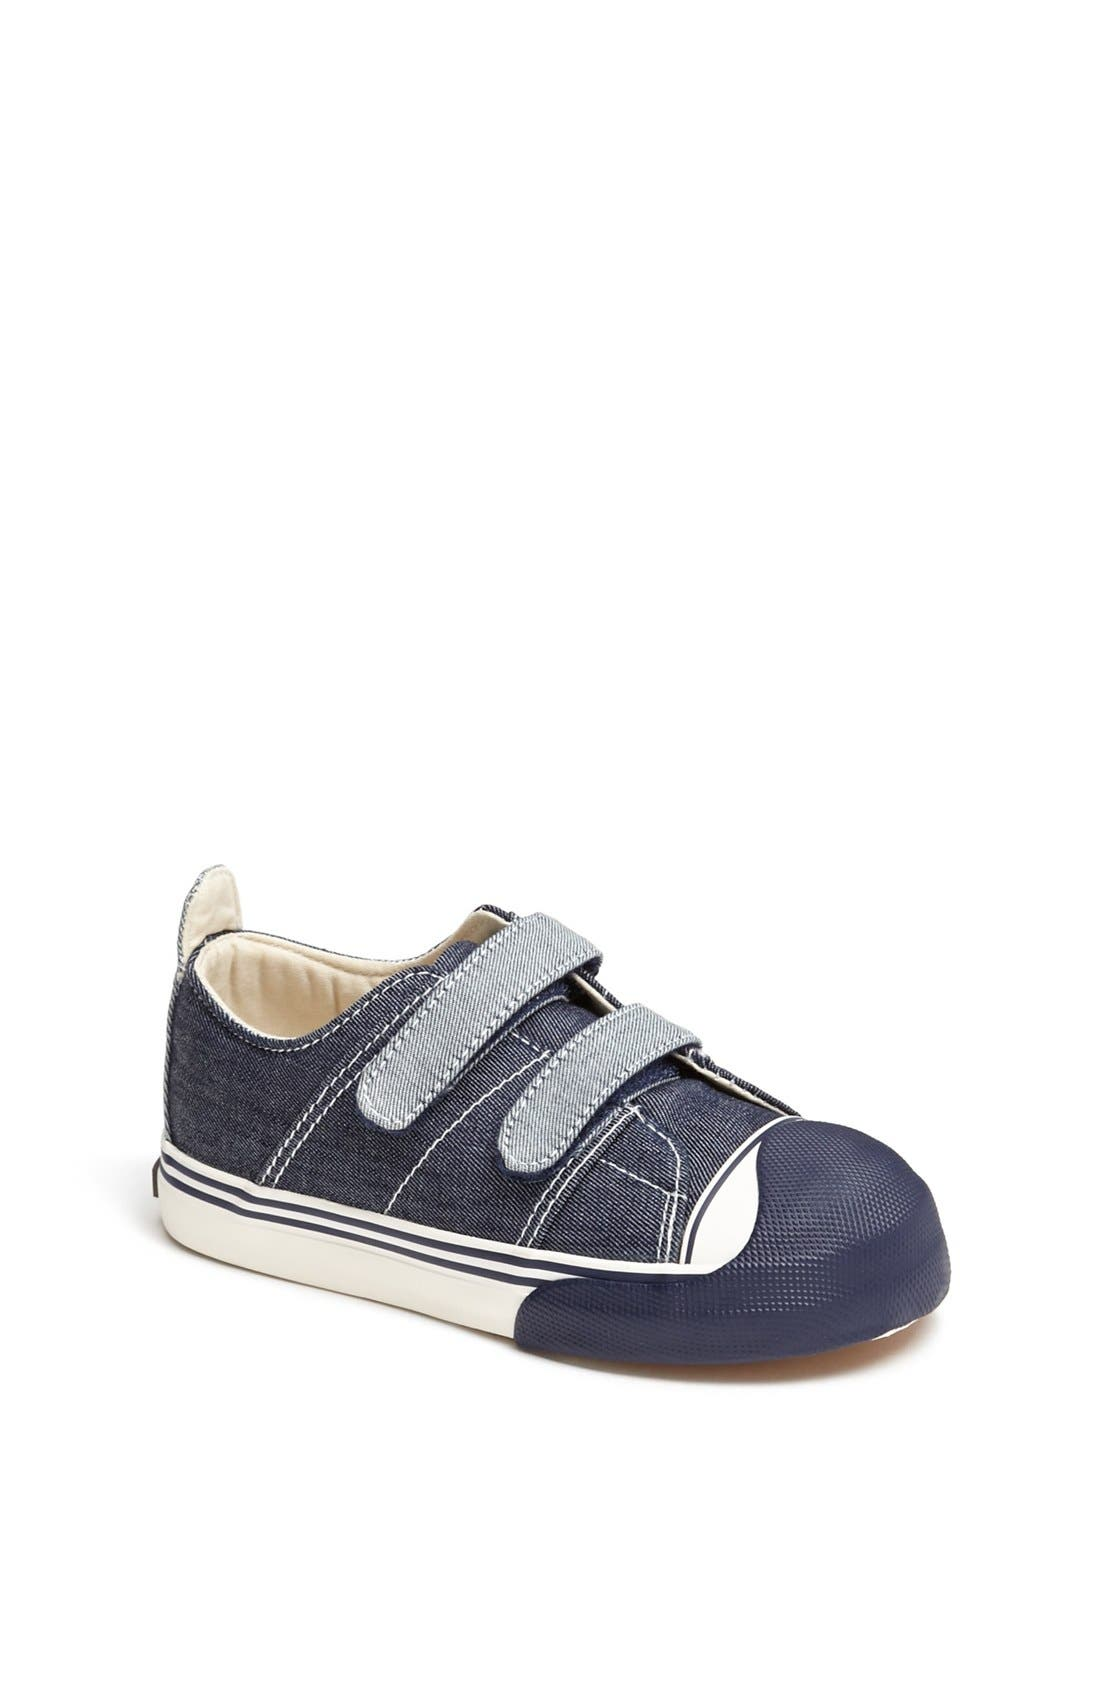 Alternate Image 1 Selected - Morgan & Milo 'Charlie' Sneaker (Walker & Toddler)